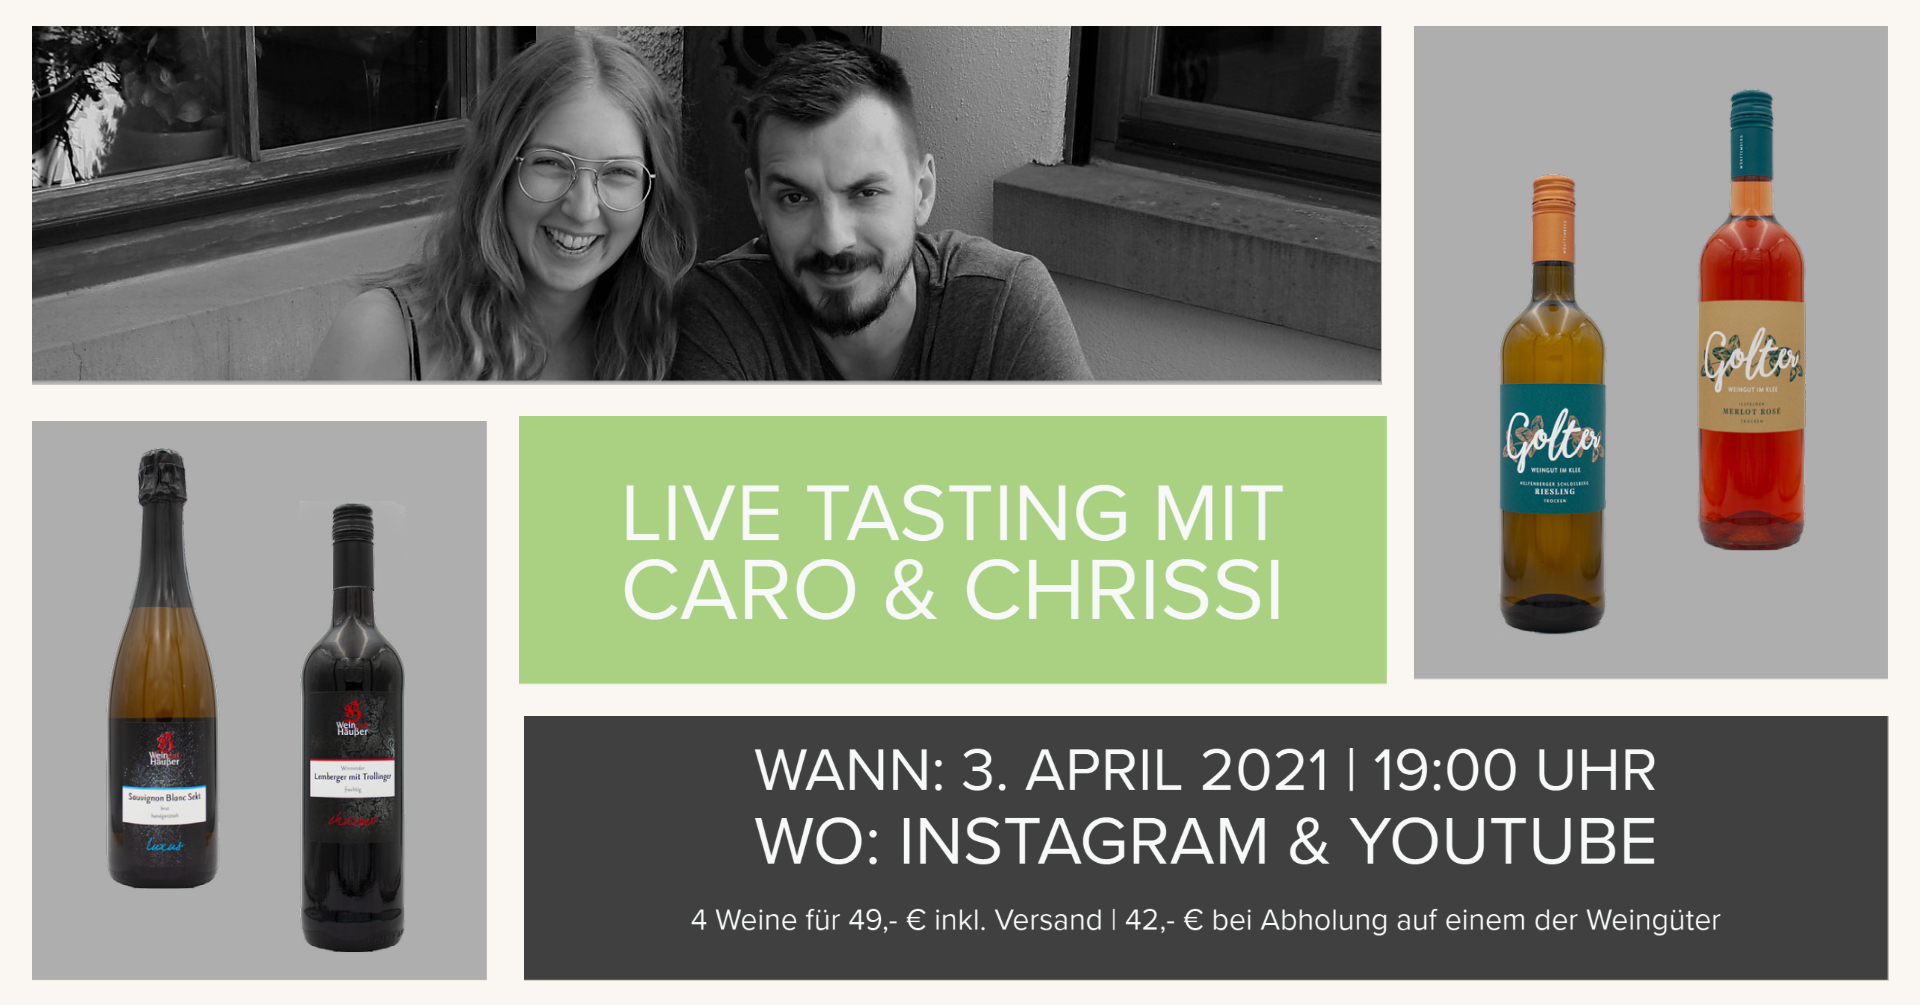 2. Live Tasting mit Caro & Chrissi